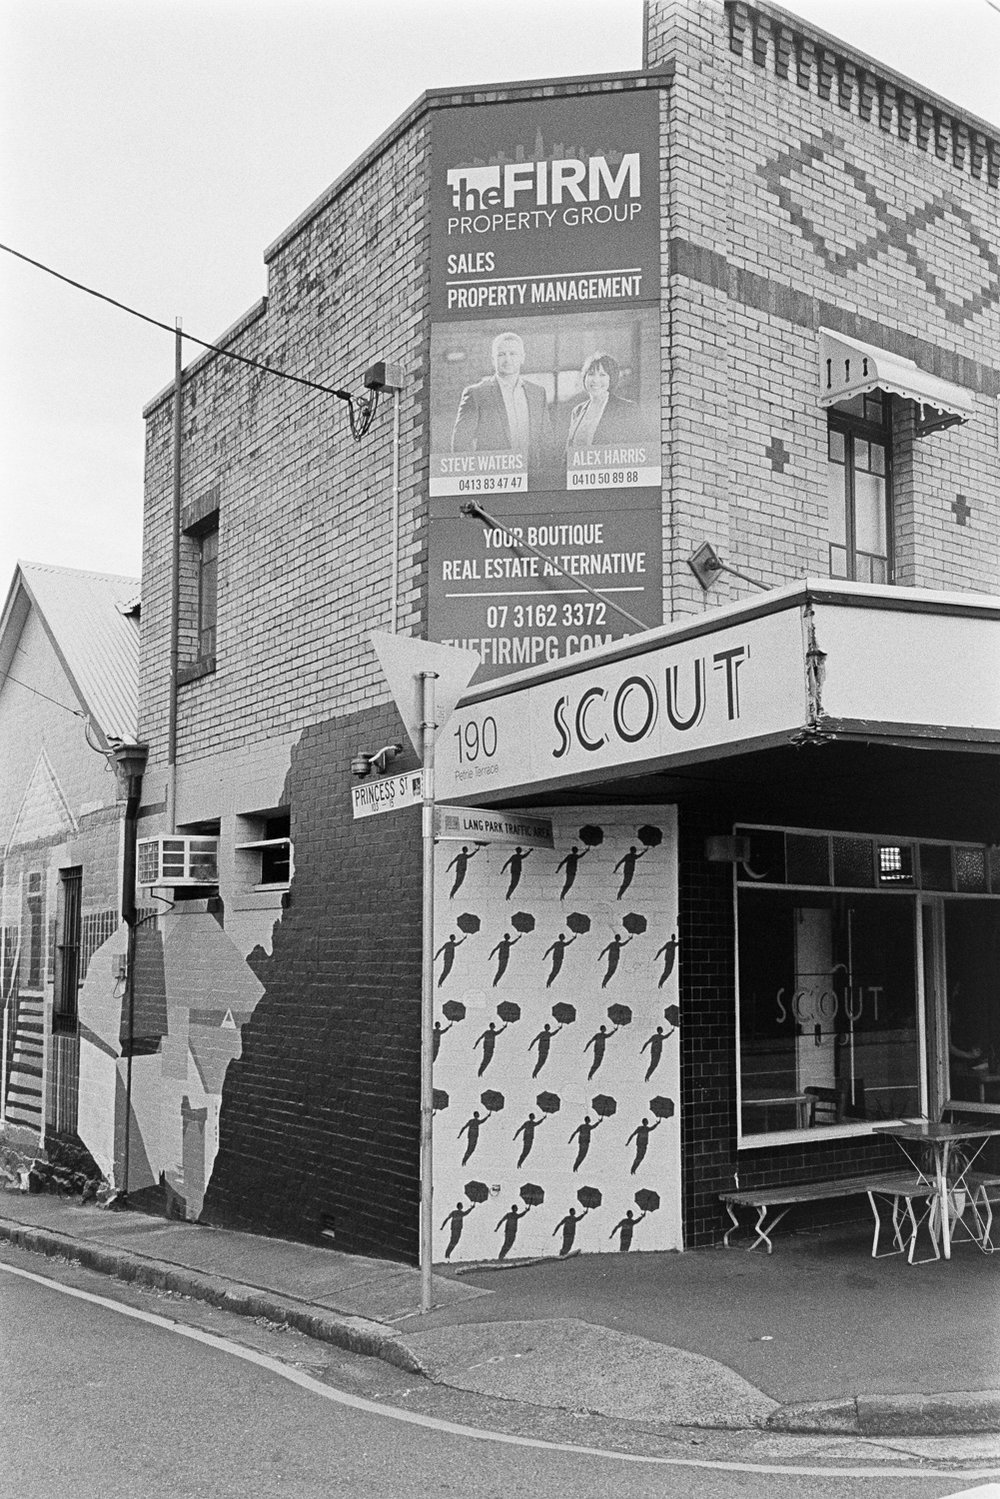 20181209 - Roll 267 - 003-Nick-Bedford,-Photographer-Black and White, Brisbane, Kodak TRI-X 400, Leica M7, Street Photography, Voigtlander 35mm F1.7.jpg